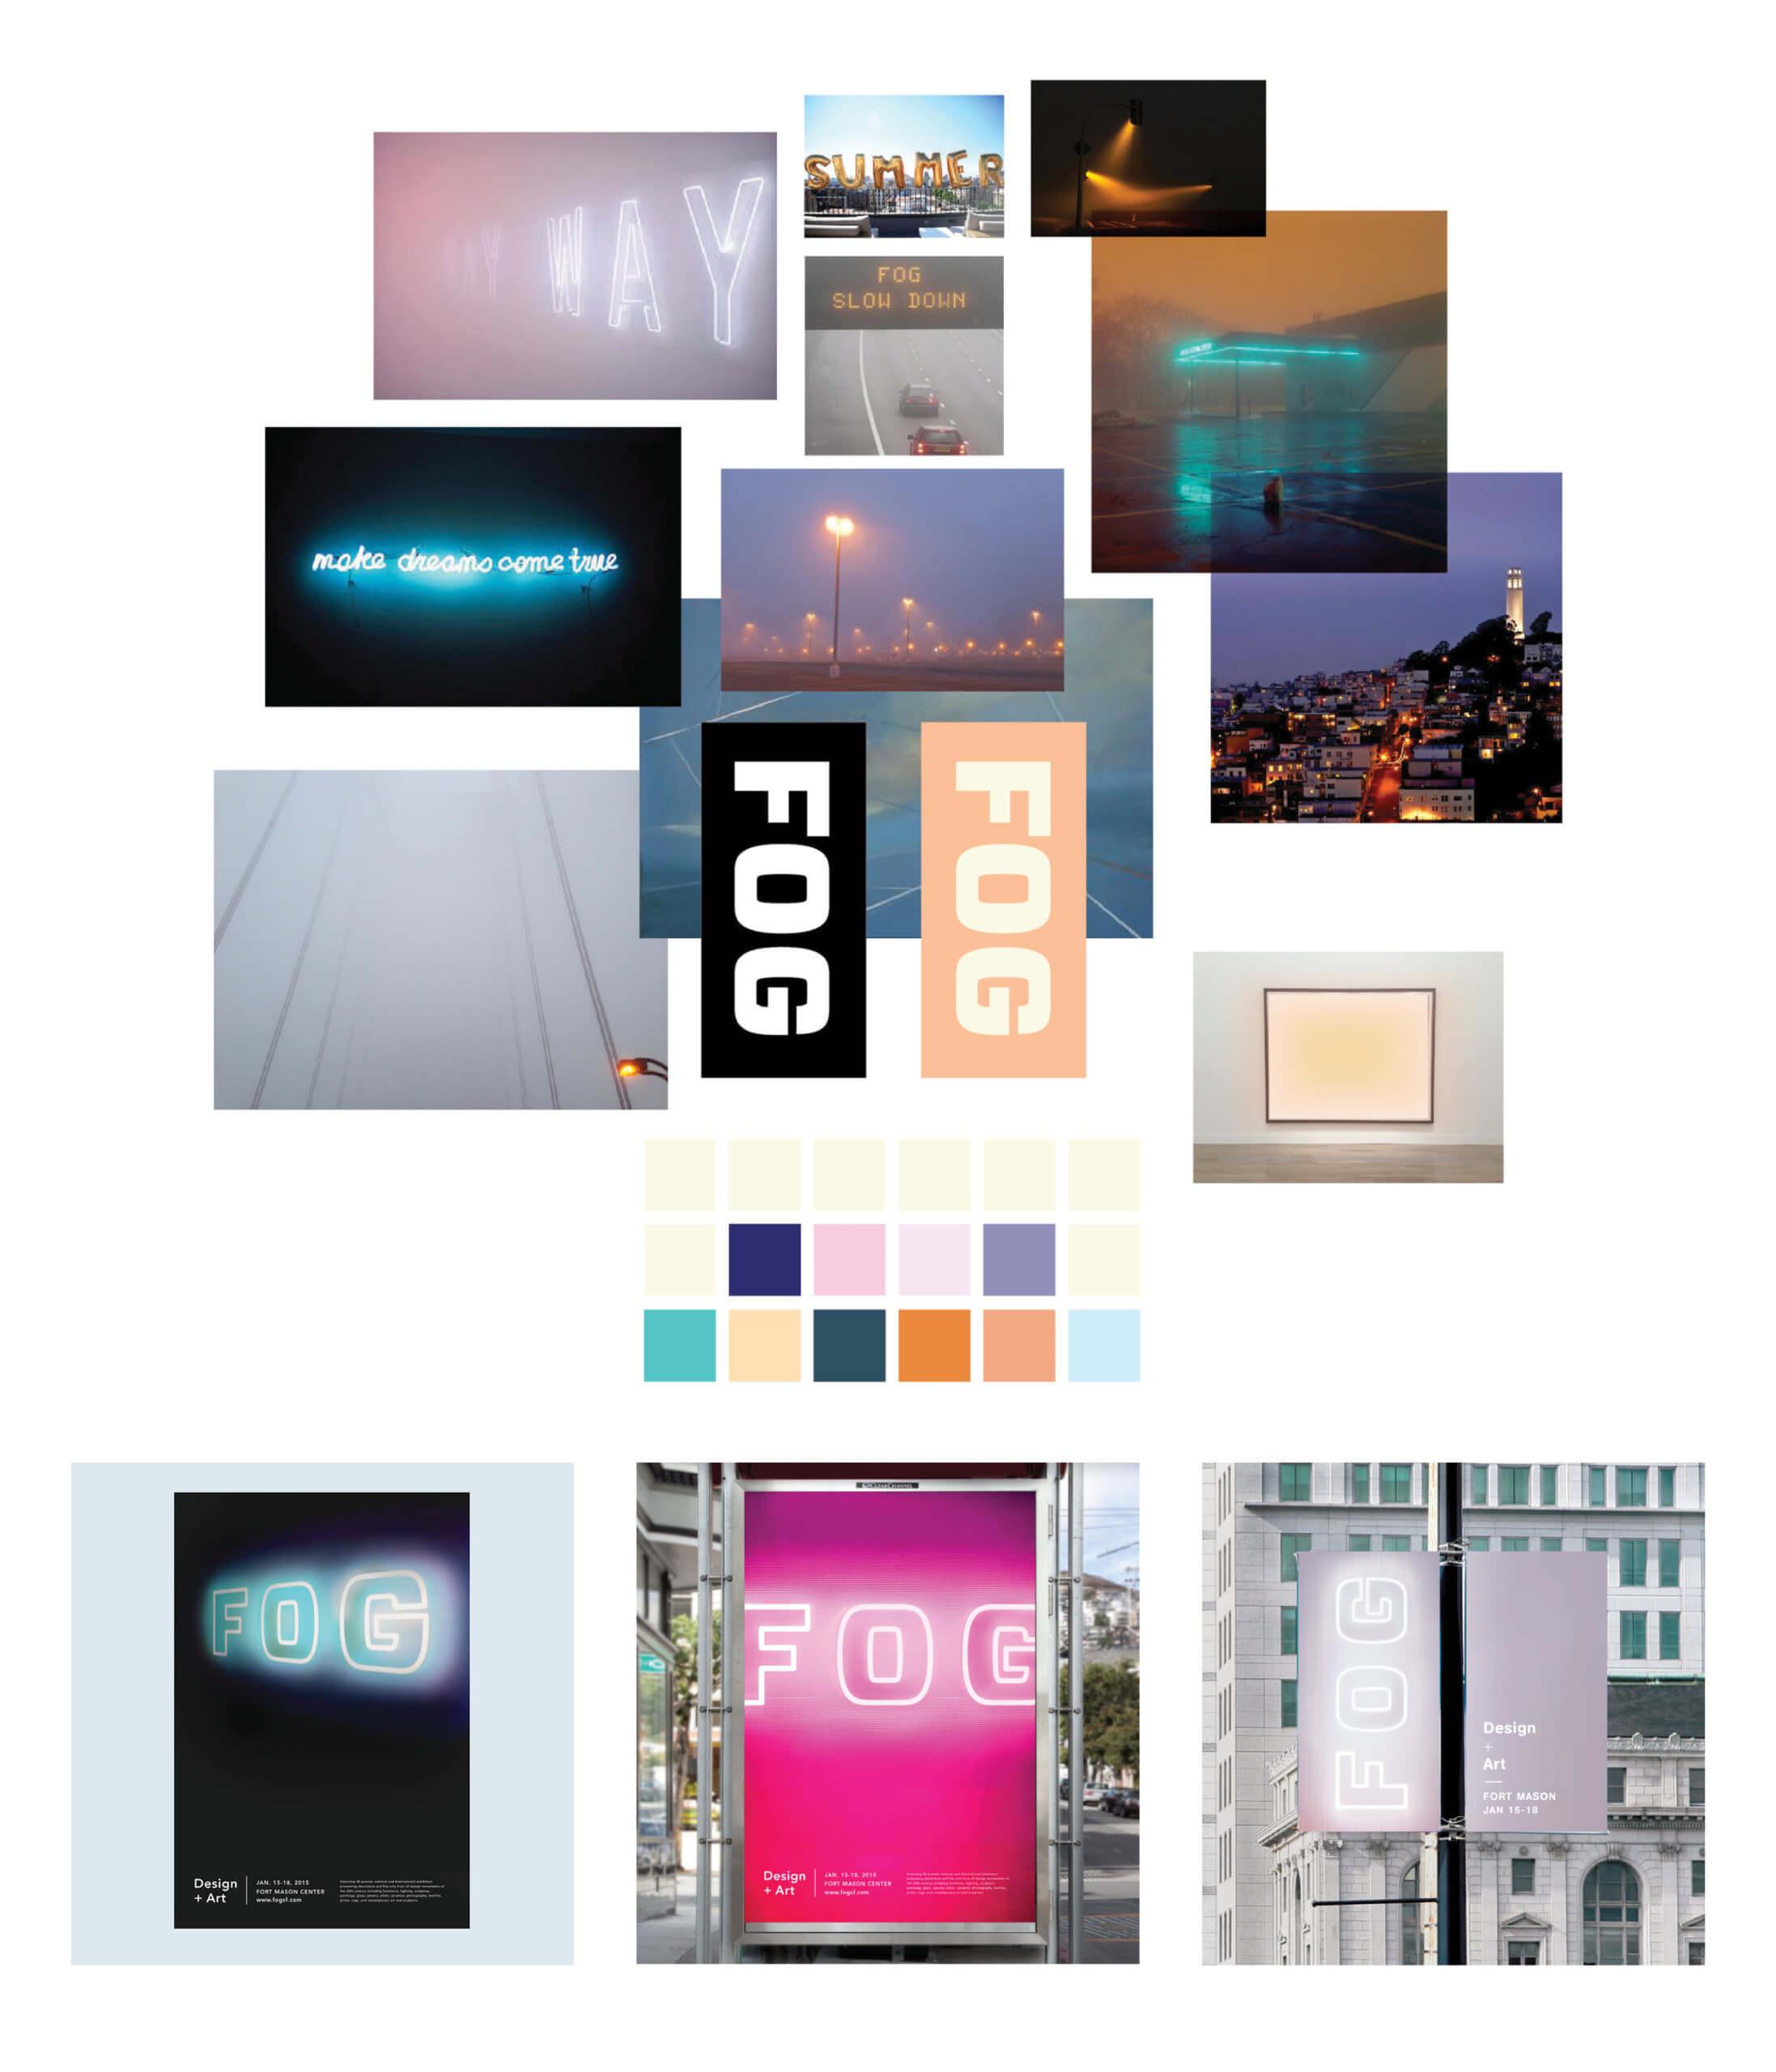 Fog Art + Design mood board 2